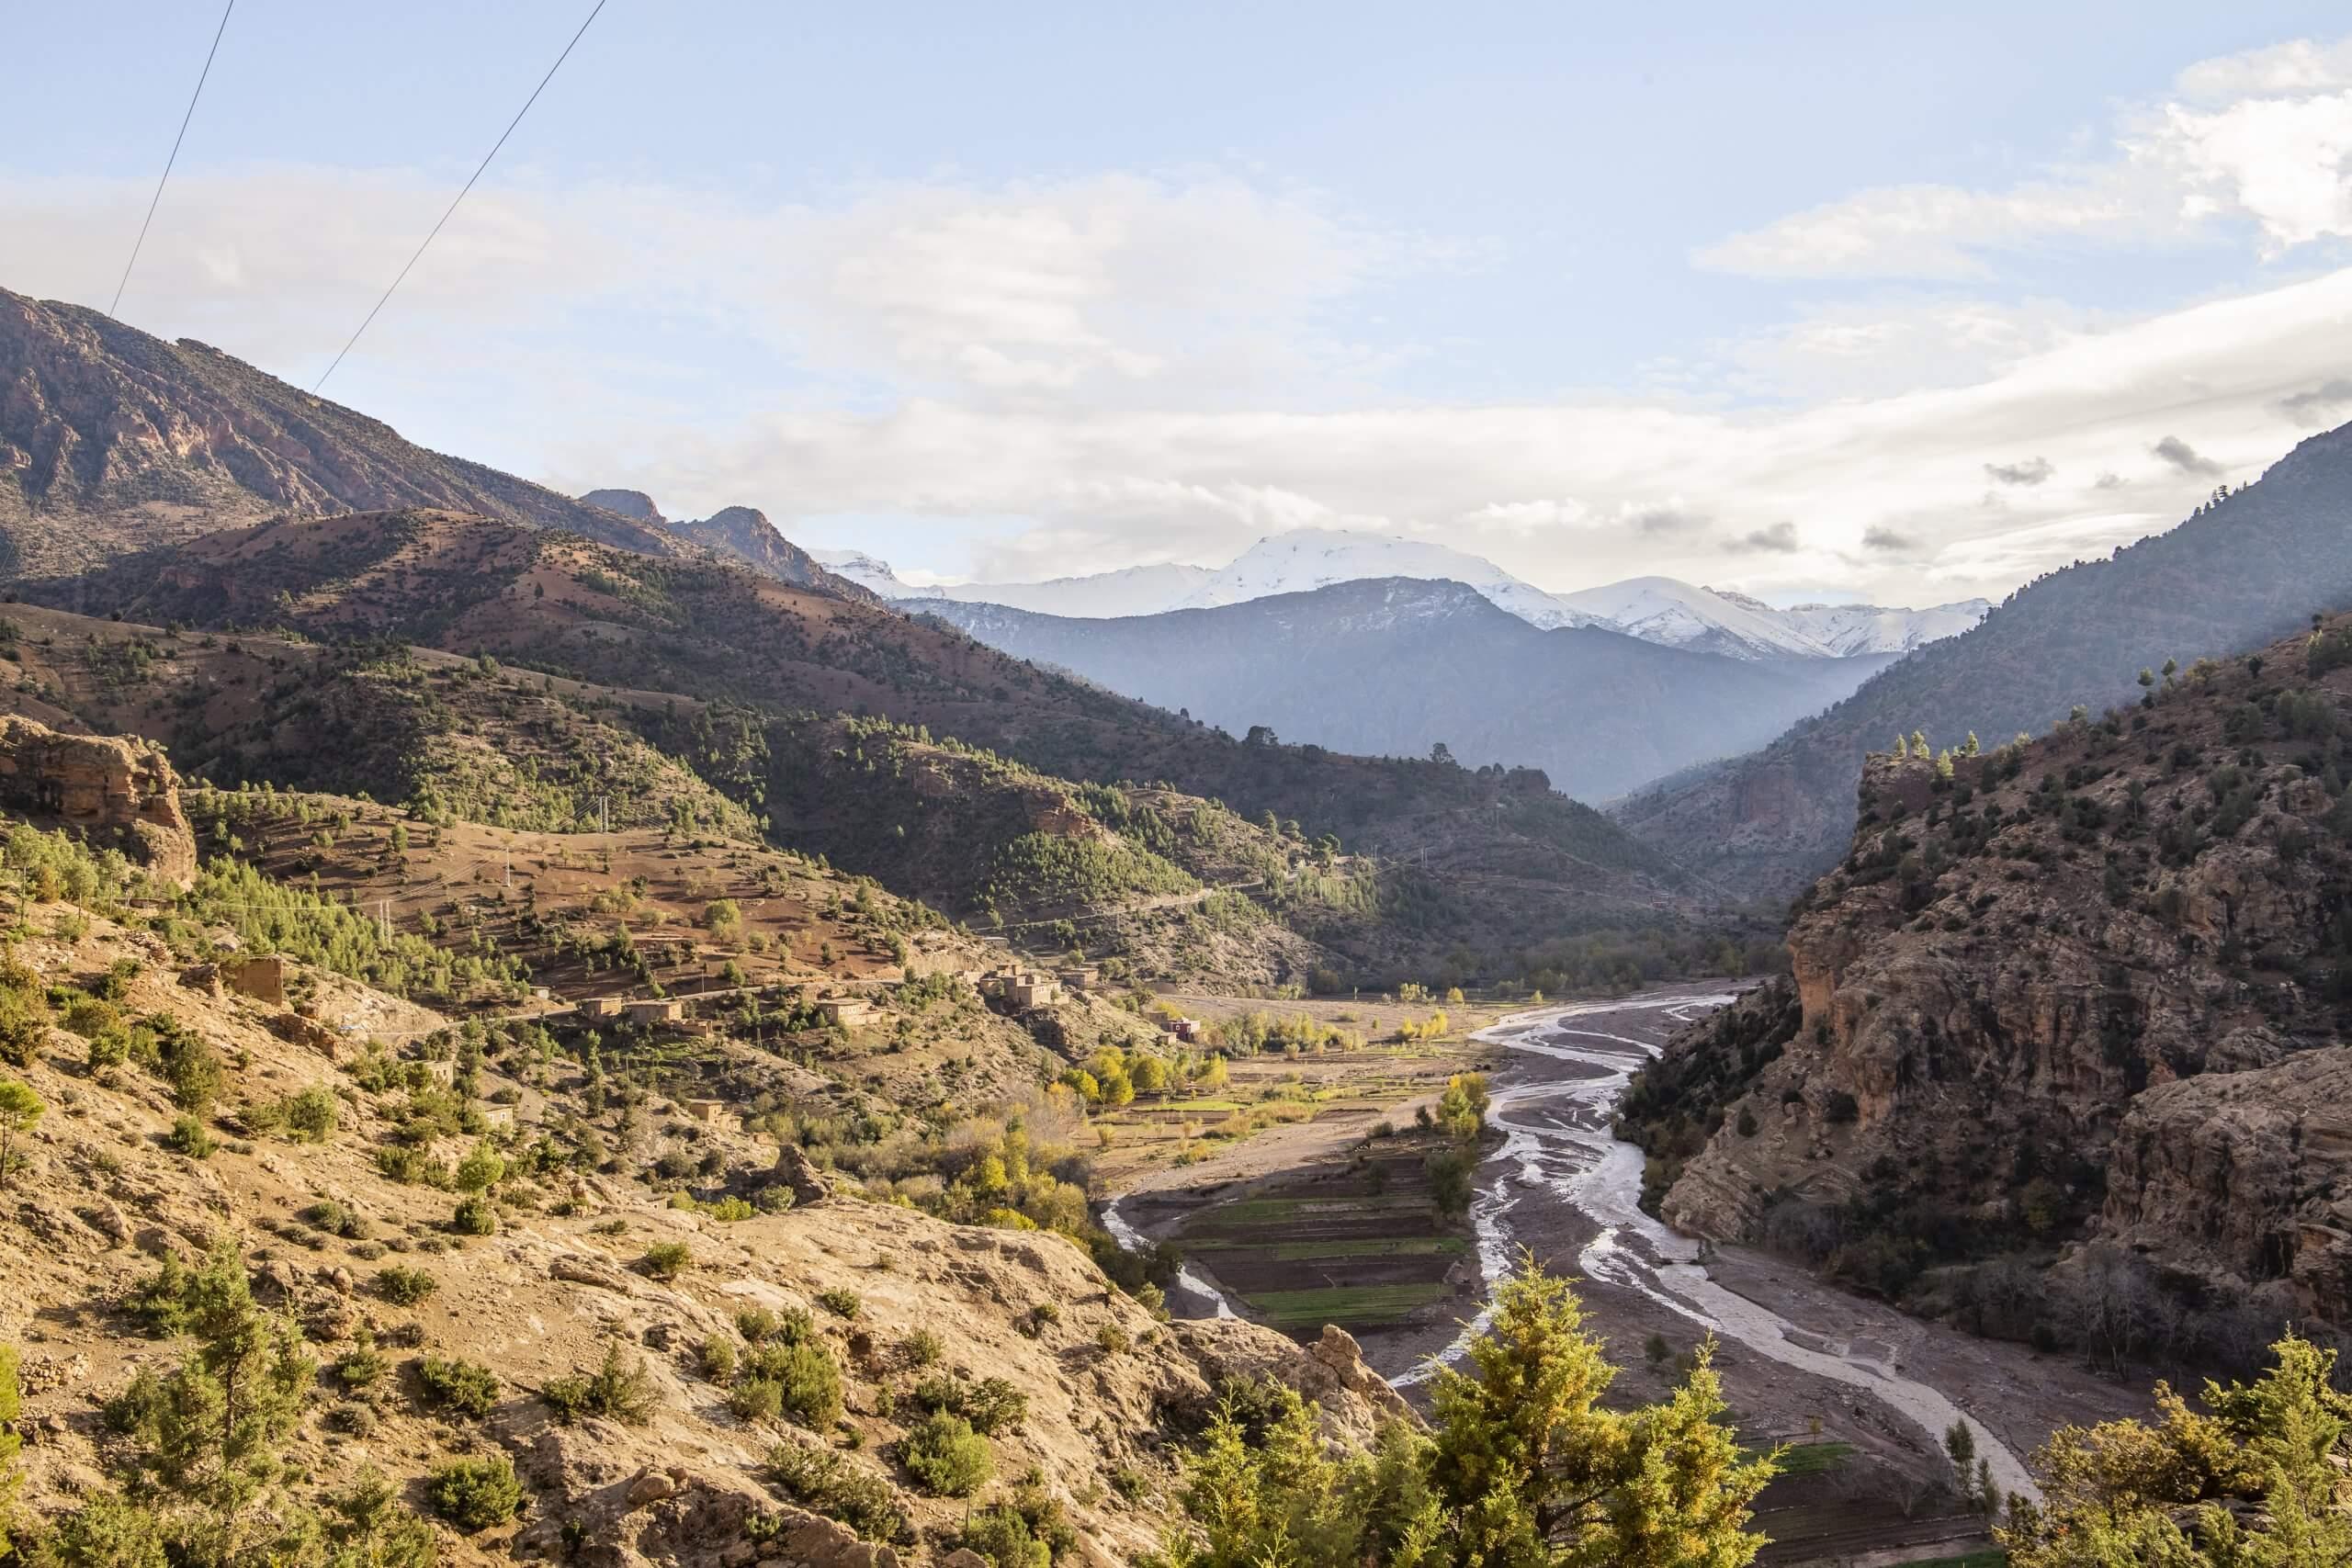 die fruchtbaren Täler des Atlas Gebirges